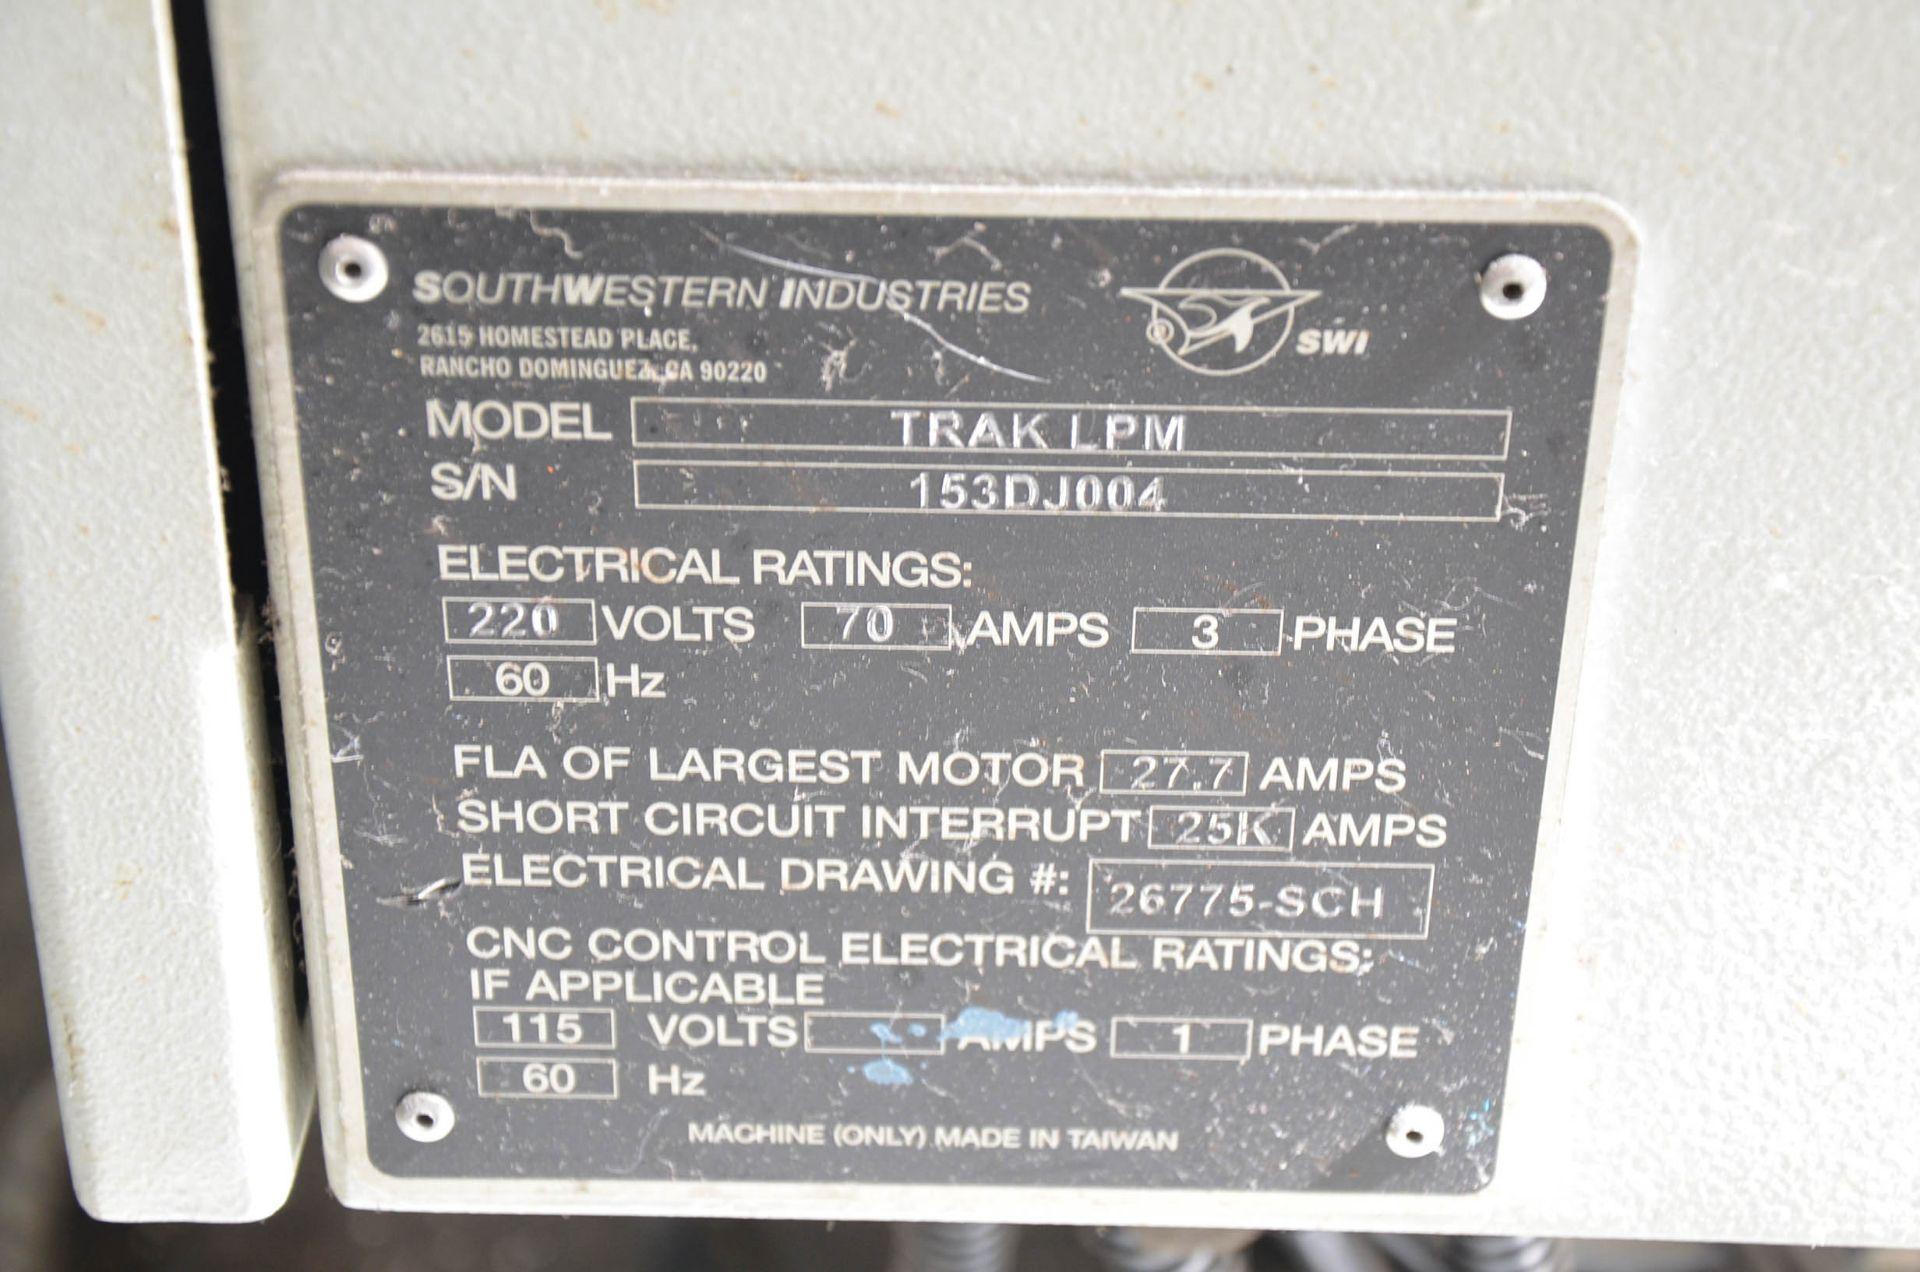 SWI (2014) TRAK LPM 4-AXIS READY CNC VERTICAL MACHINING CENTER WITH PROTO TRAK PMX CNC CONTROL, 19. - Image 5 of 12